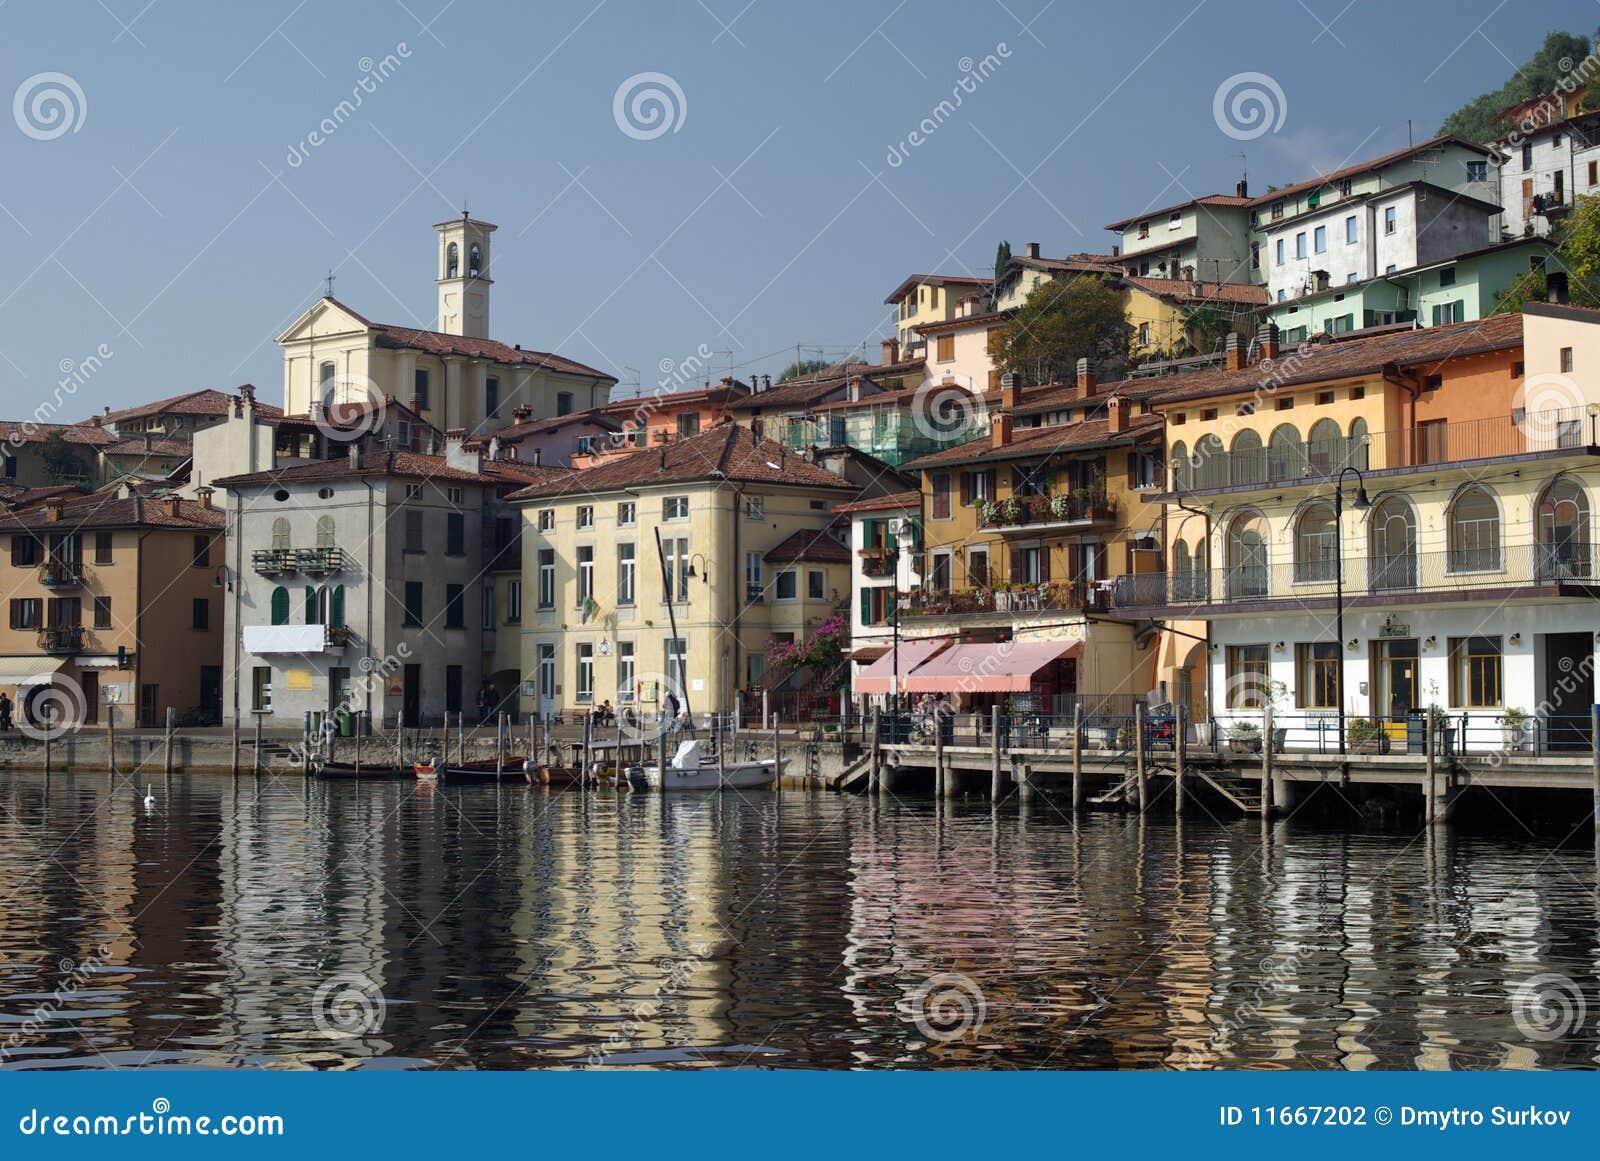 Town Of Peschiera, Iseo Lake, Italy Stock Photo - Image ...